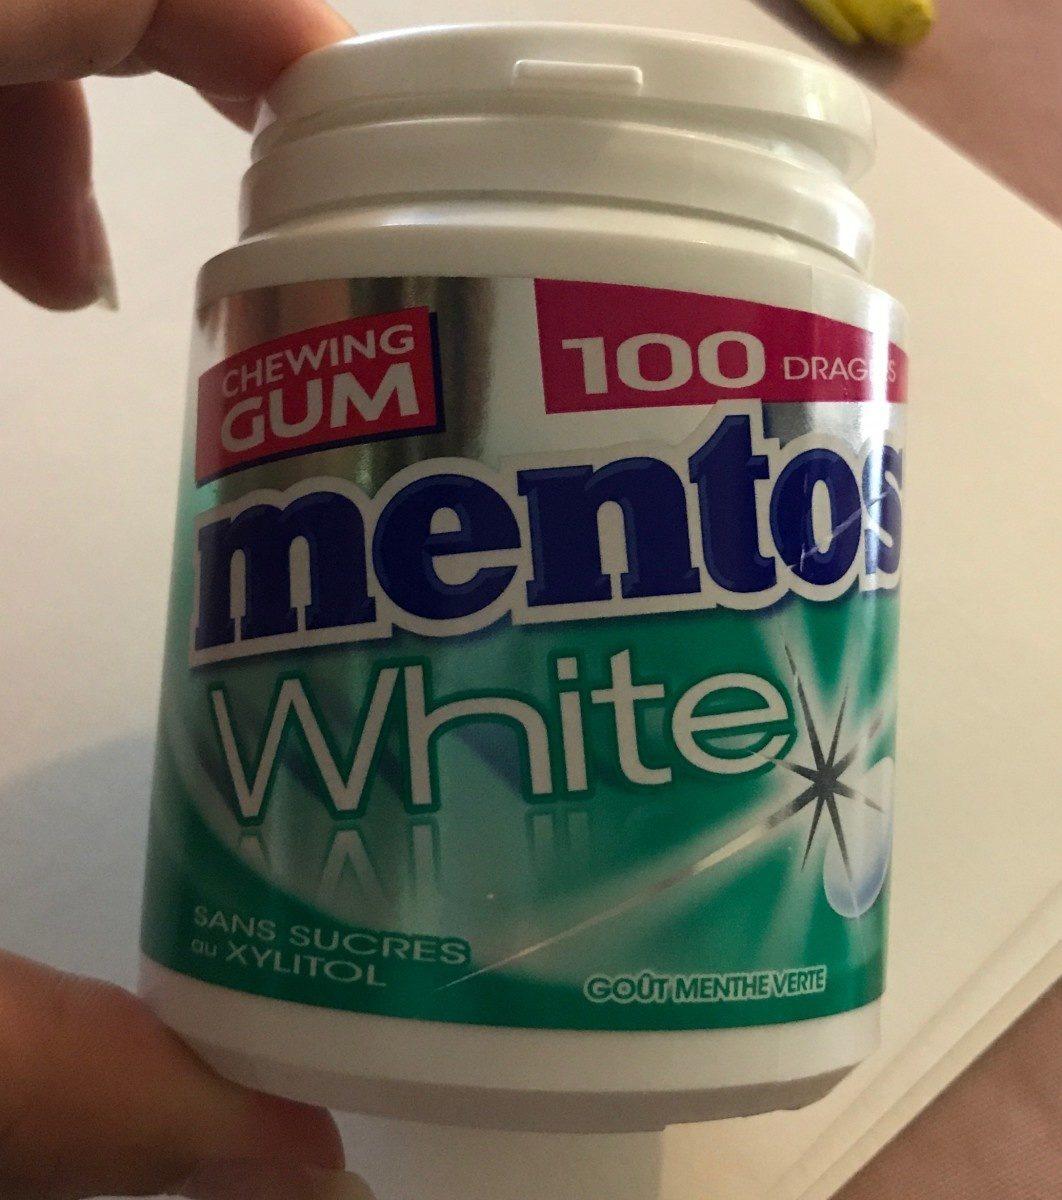 Chewing-gum Mentos White Menthe Verte - Prodotto - fr